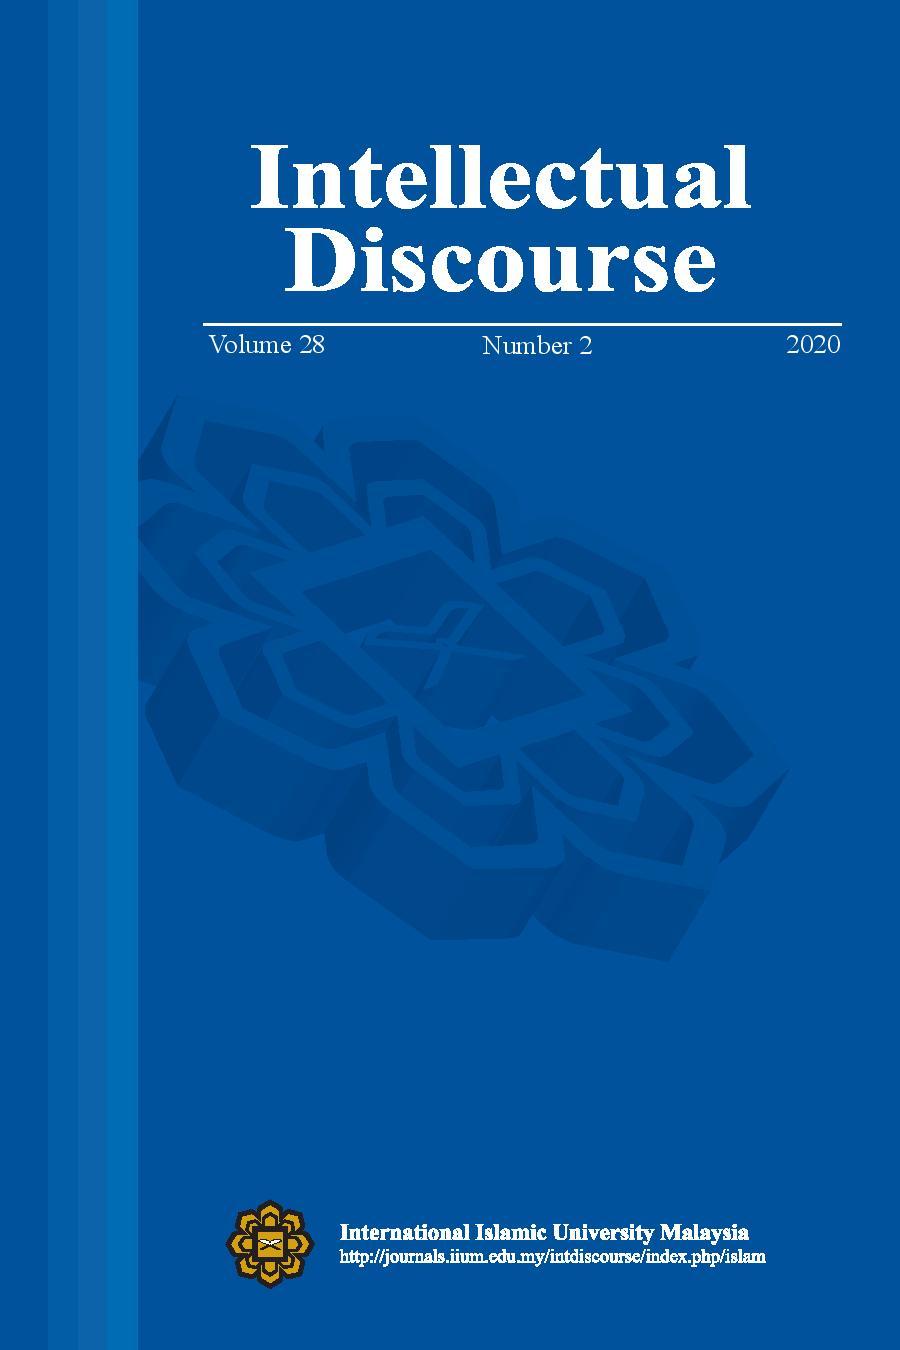 View Vol. 28 No. 2 (2020): Intellectual Discourse